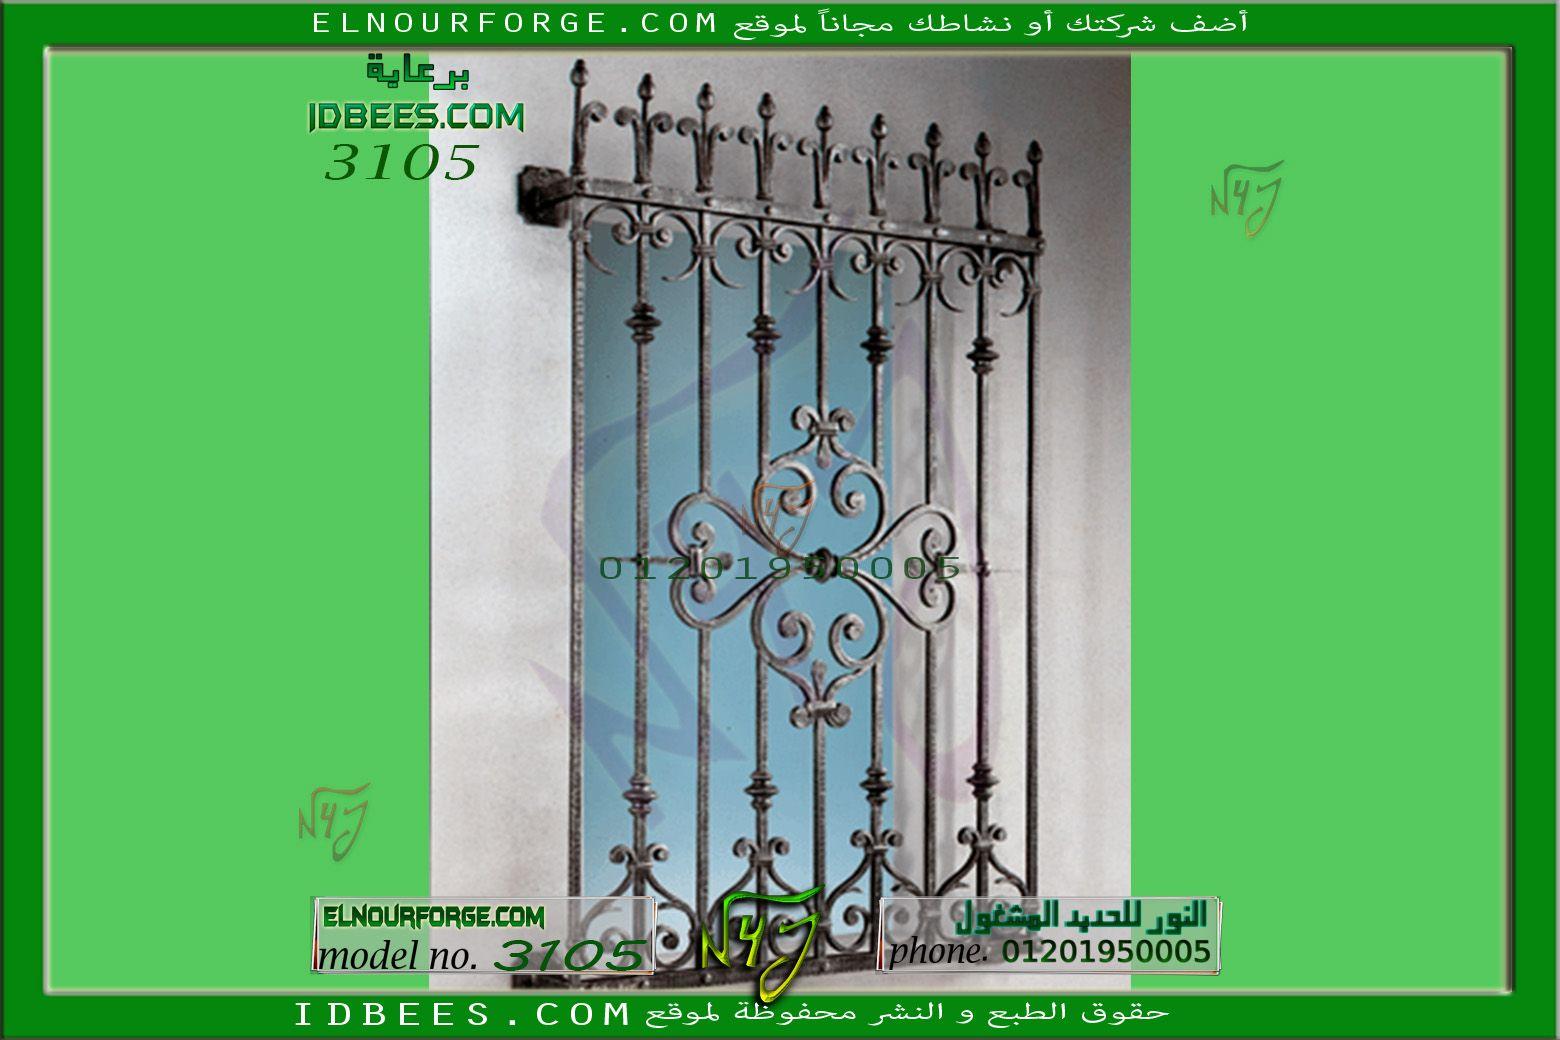 3105 Window Wrought Iron نوافذ شبابيك حديد مشغول Decor Home Decor Supplies